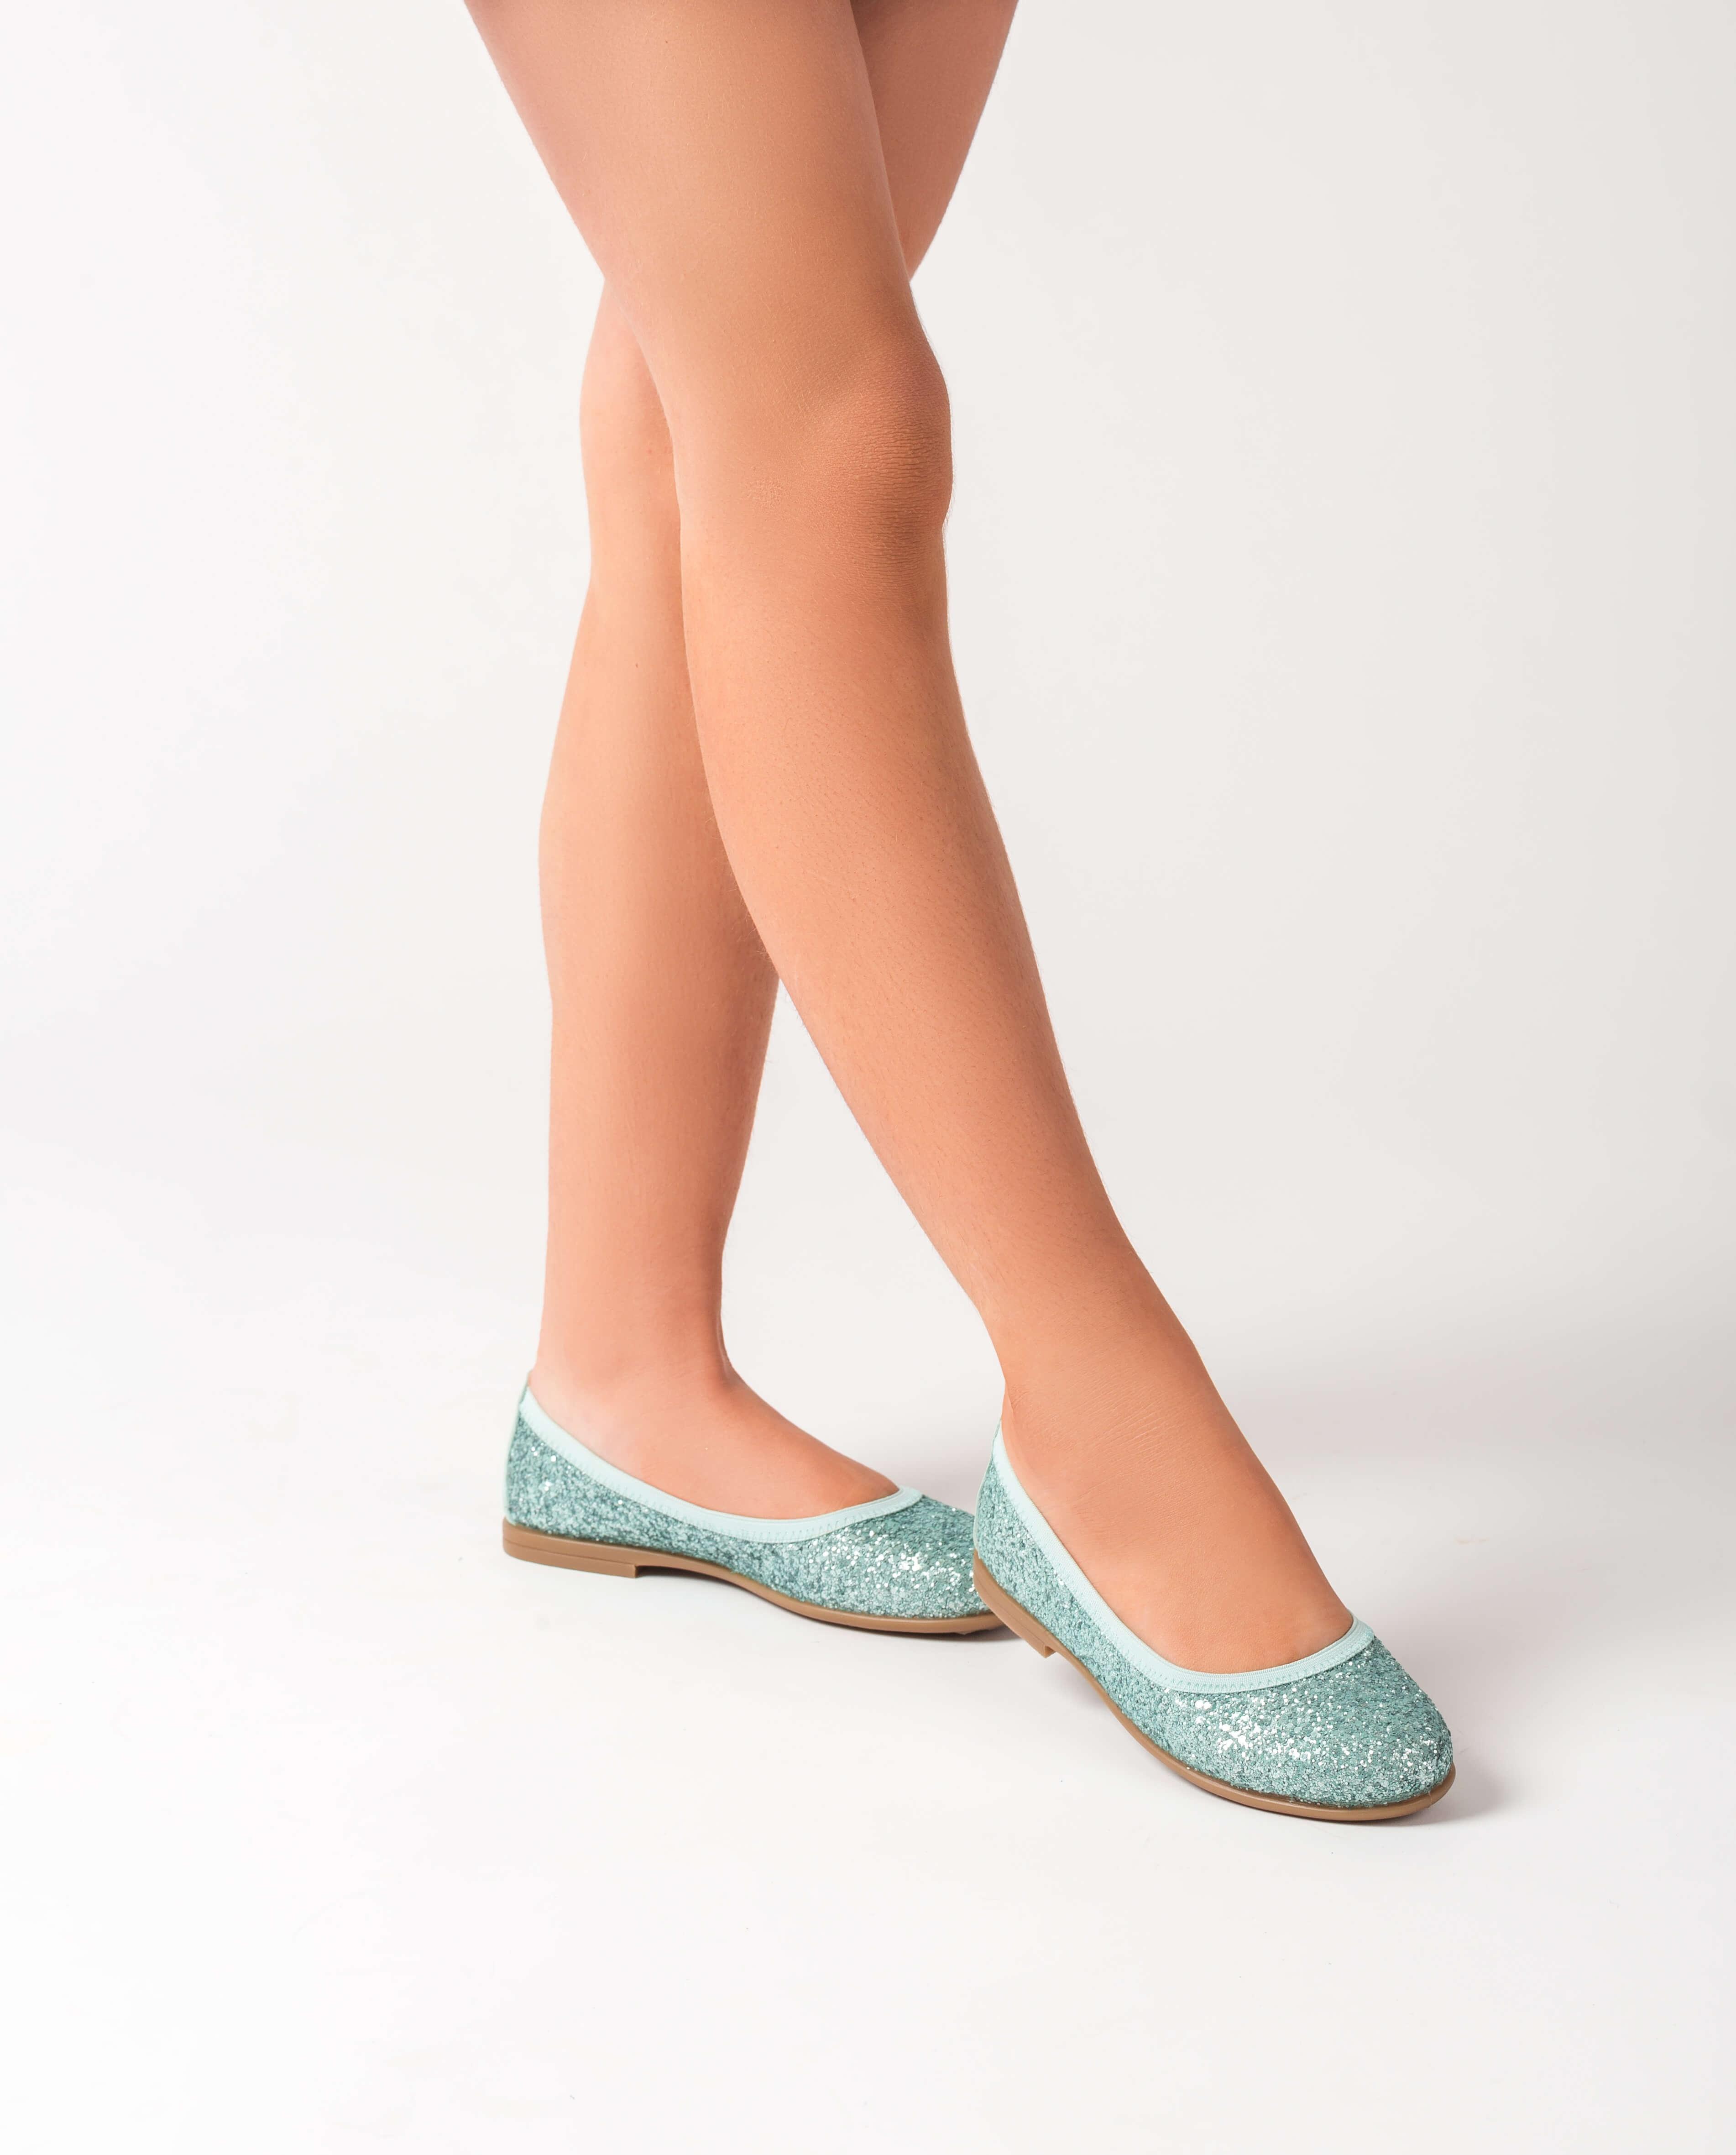 UNISA Bailarina niña glitter SABRINA_20_GL mint